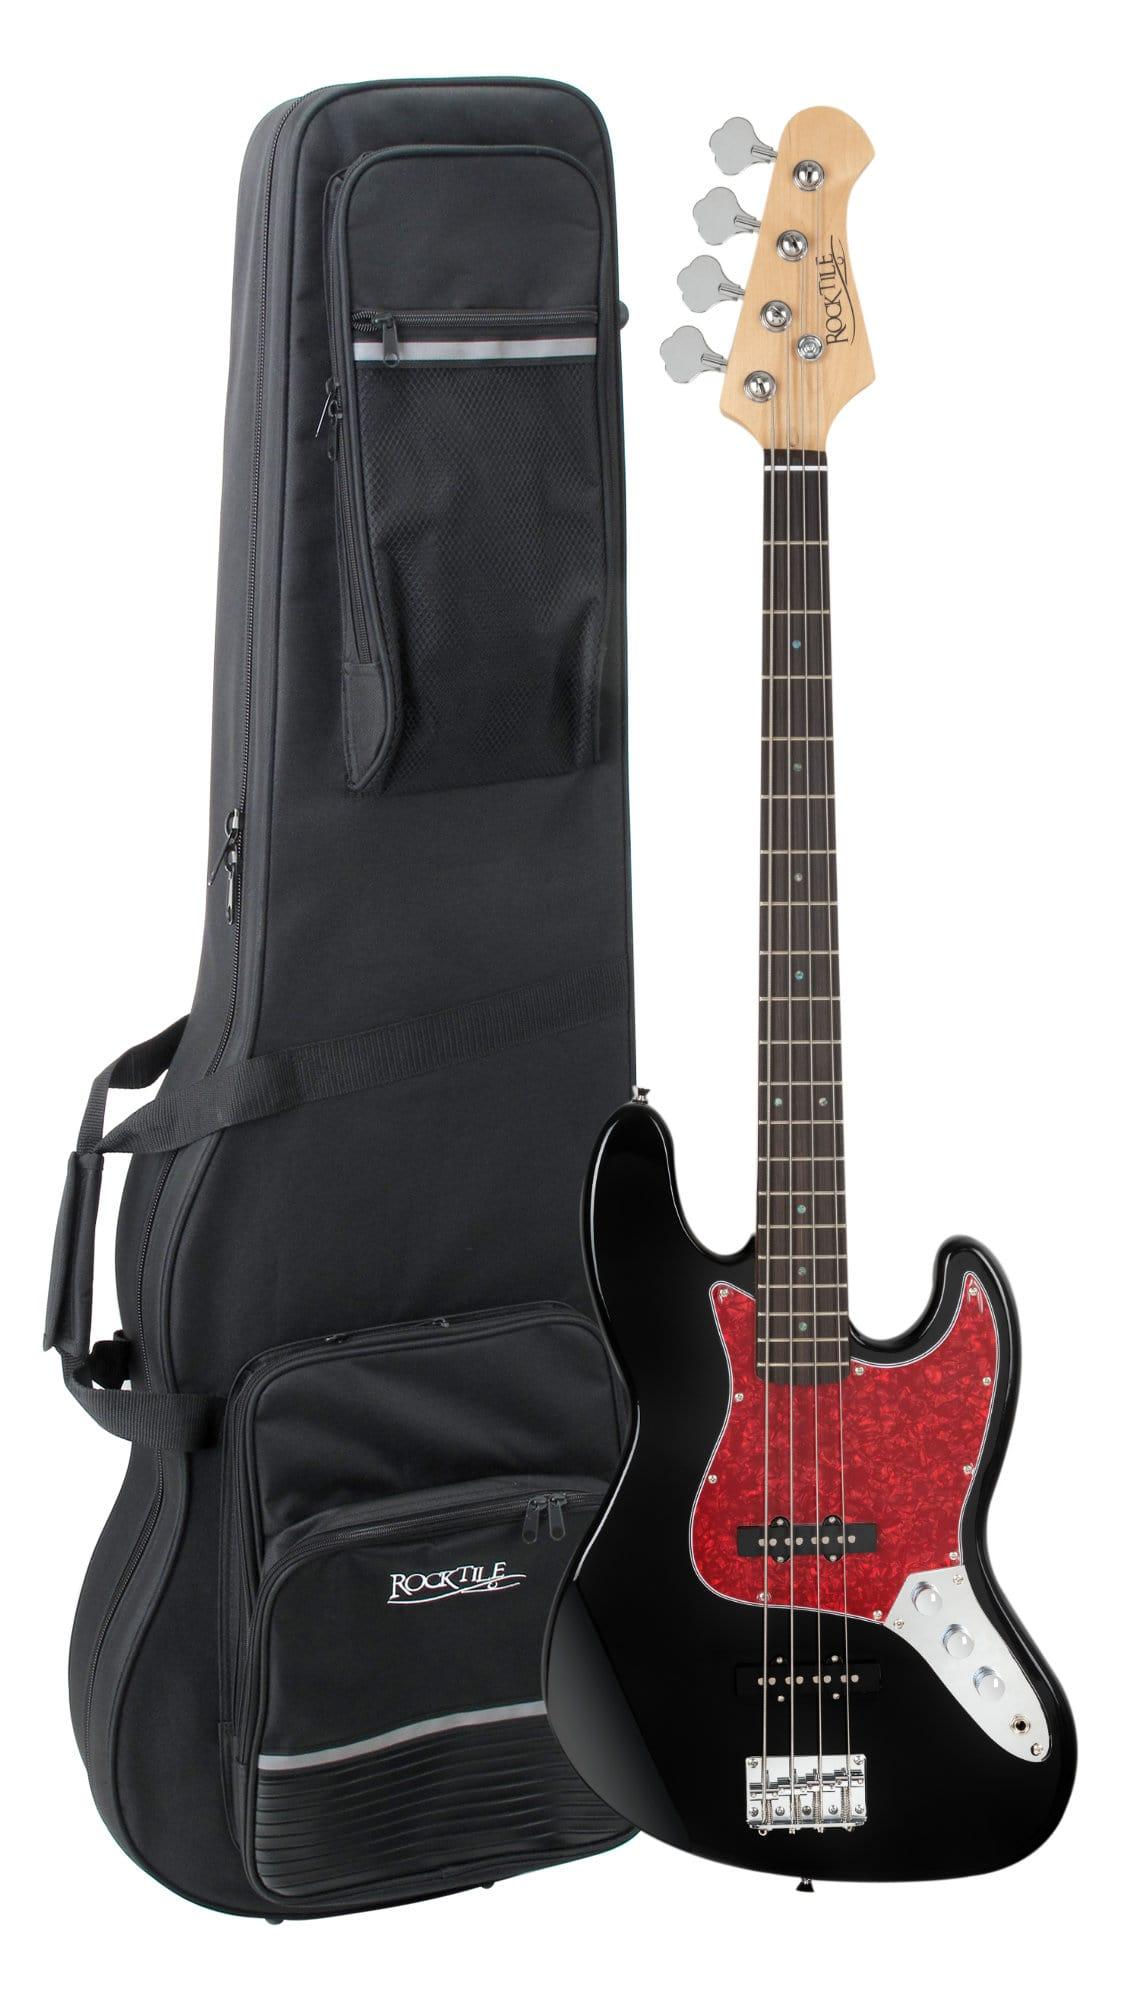 Ebaesse - Rocktile Pro JB 30BK 70s Deluxe E Bass Black Set inkl. Leichtkoffer - Onlineshop Musikhaus Kirstein